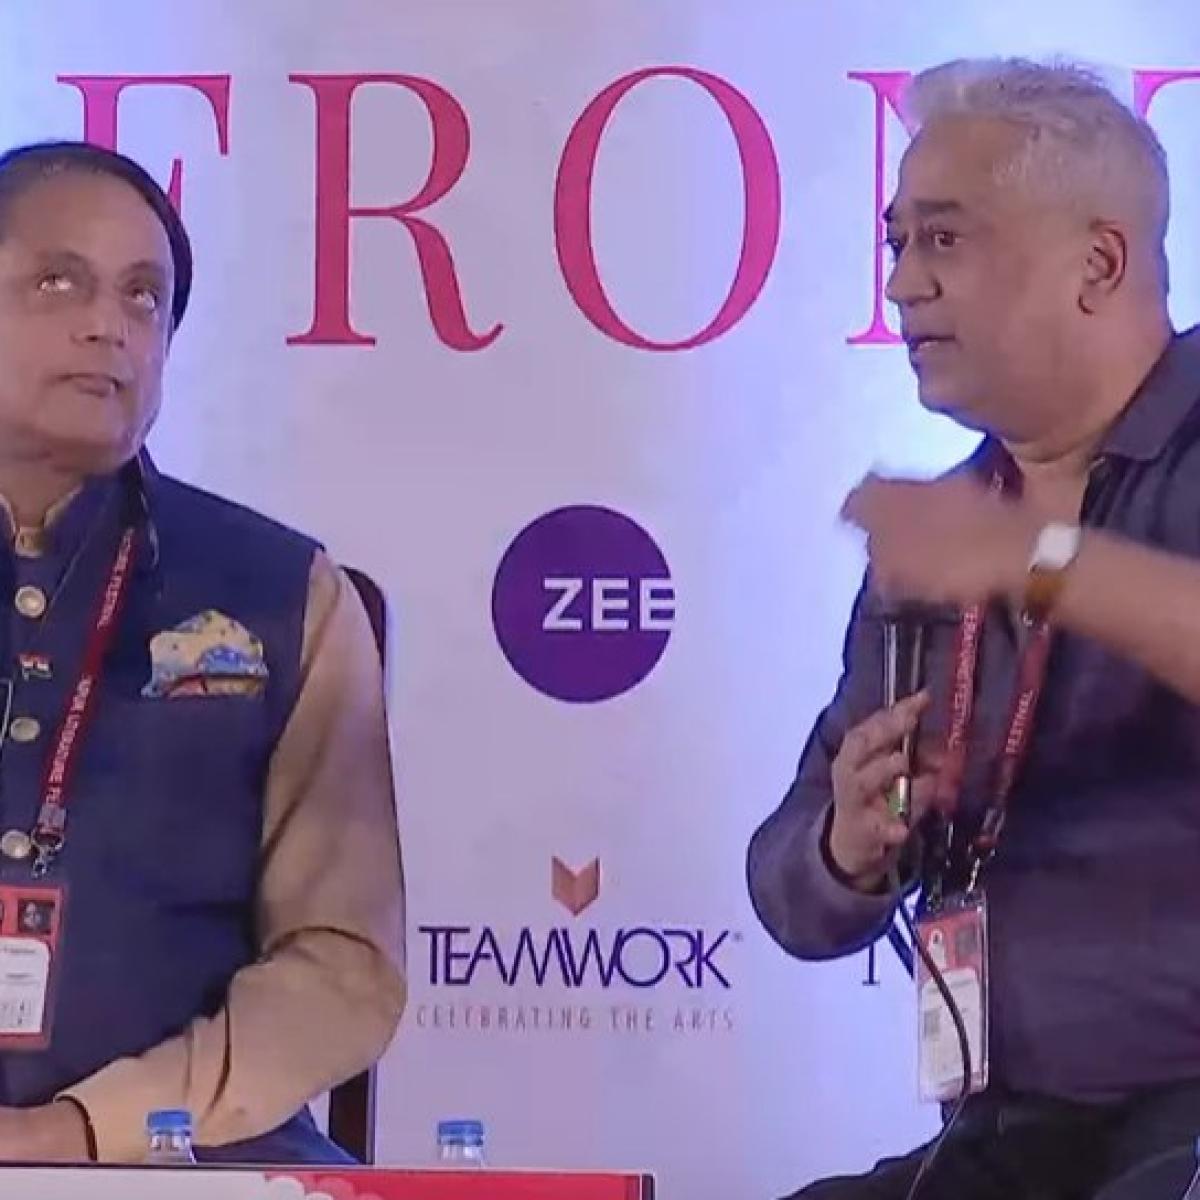 'Kohli has done for cricket, what Modi did for politics': Rajdeep Sardesai hails Team India captain at Zee JLF 2020